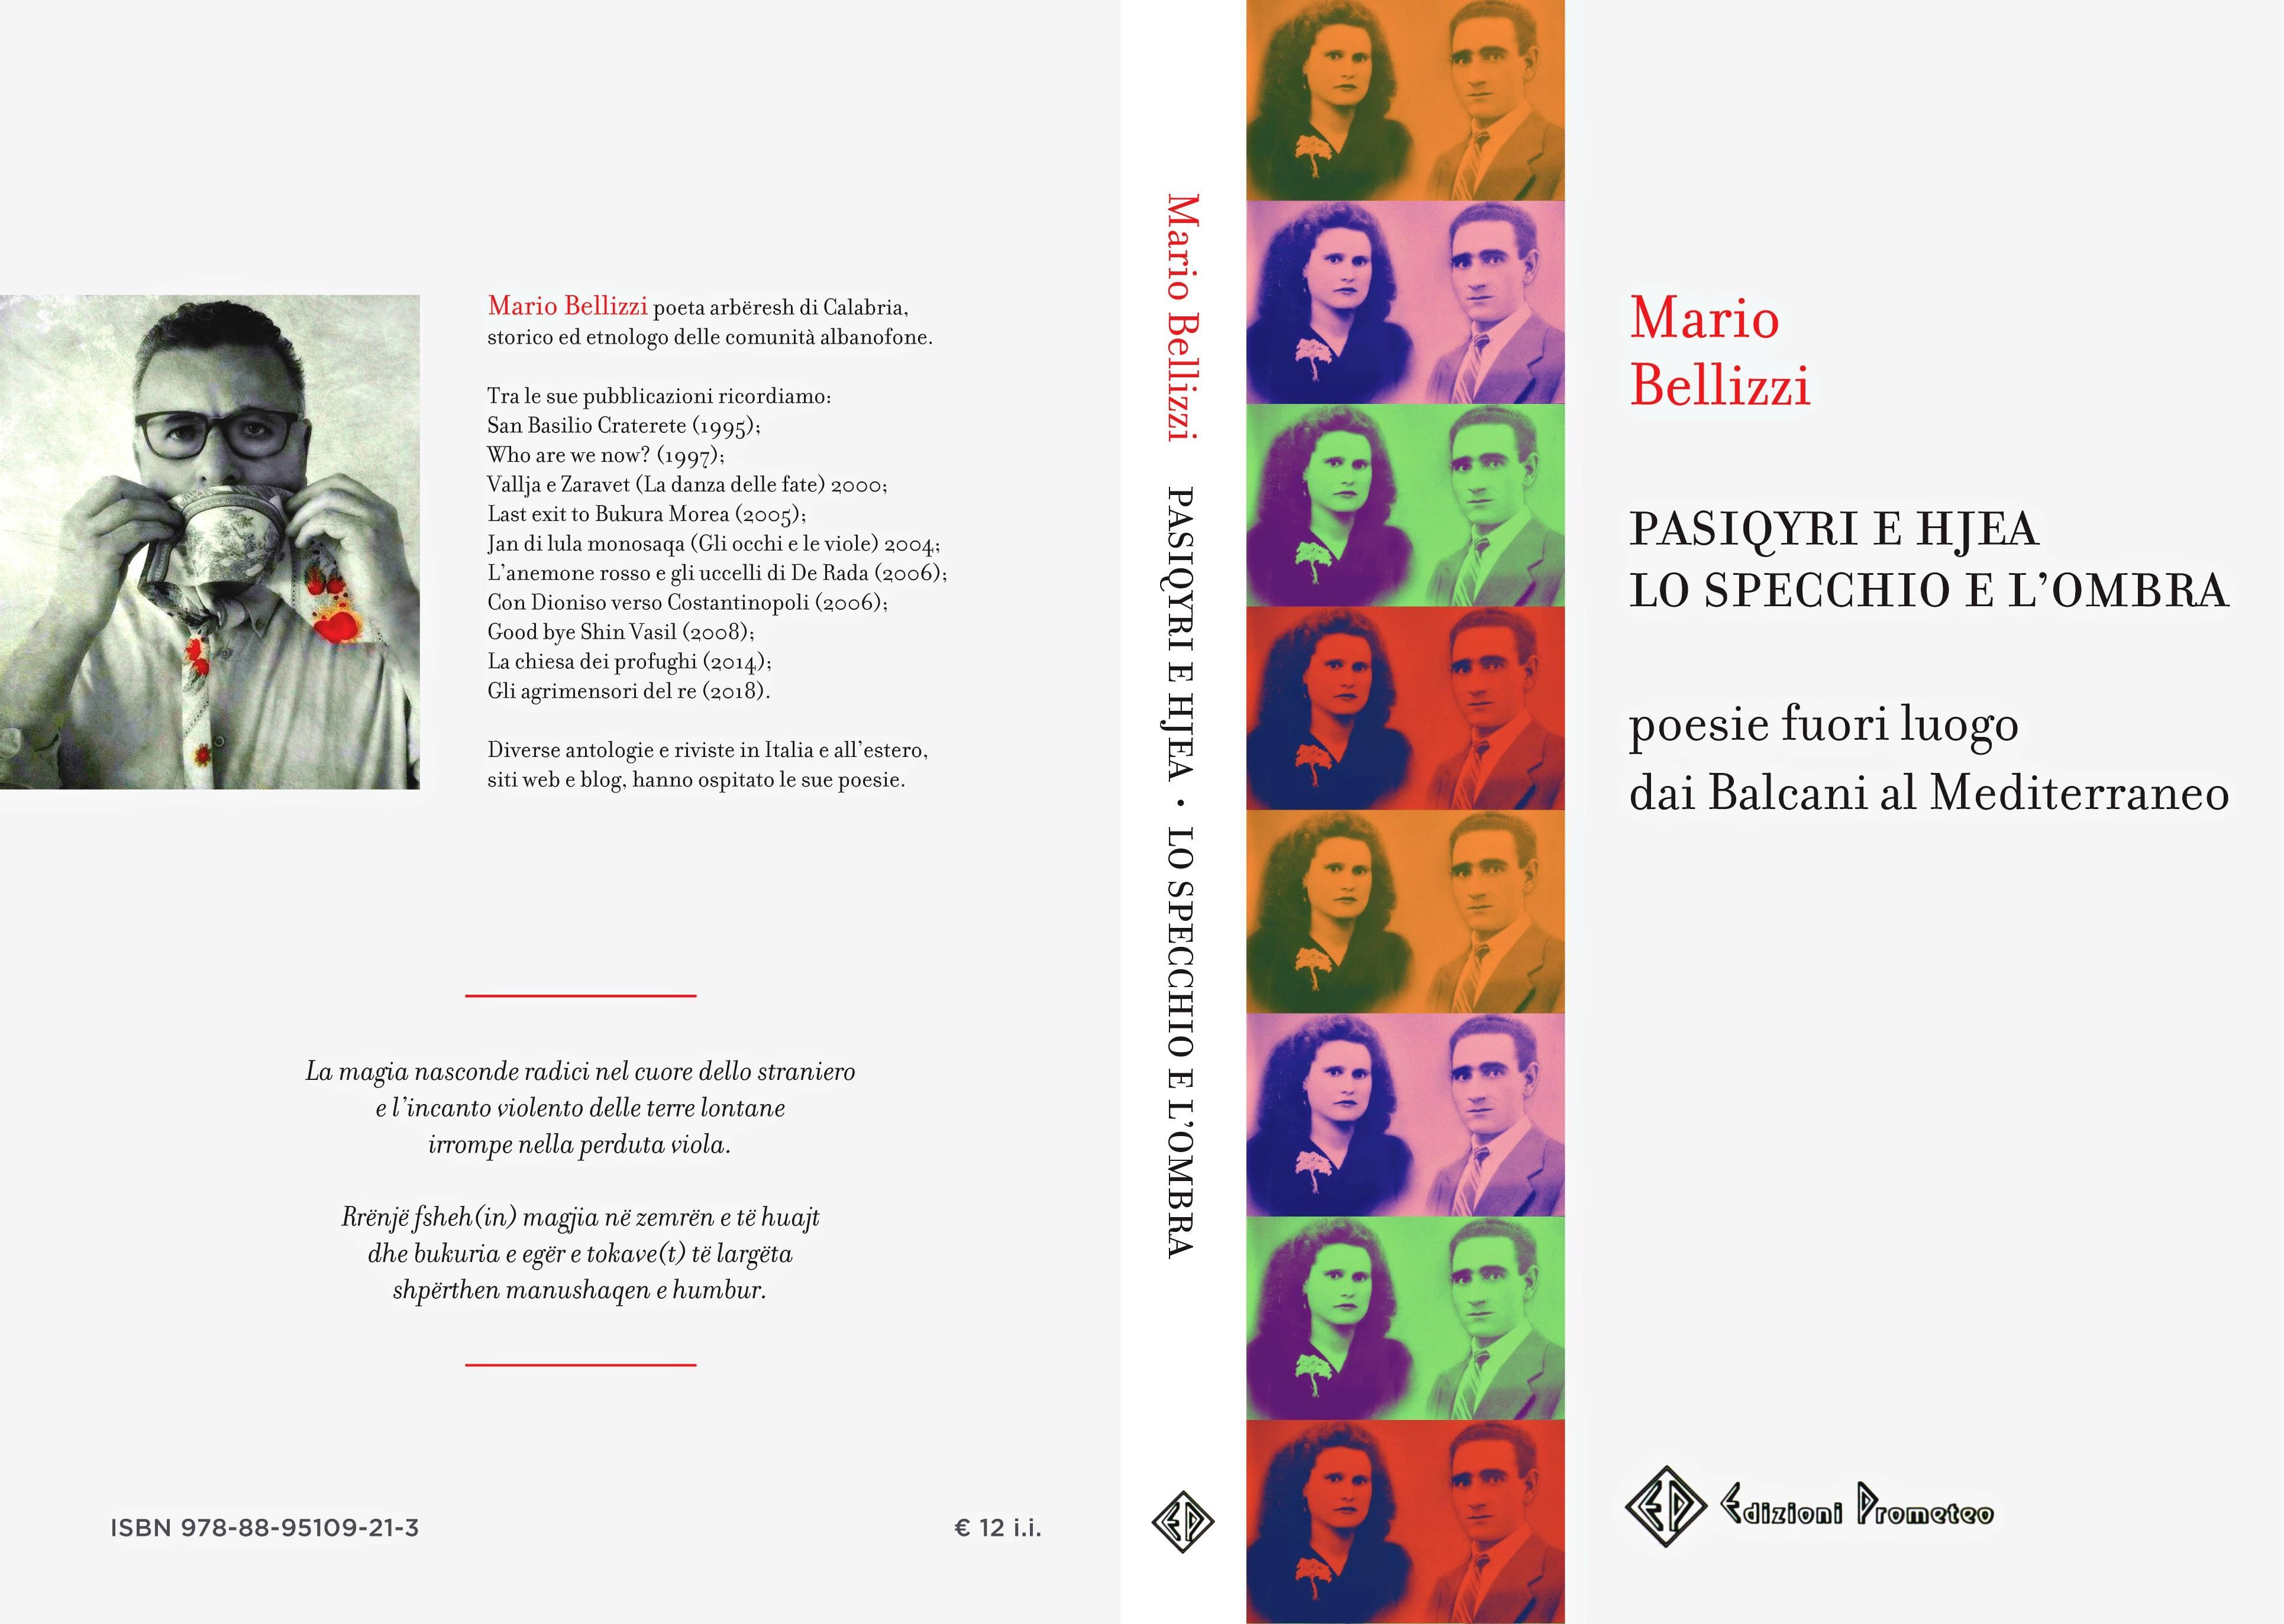 I Poeti Contemporanei 137 - 7 autori (I Poeti Contemporanei - 7 autori) (Italian Edition)